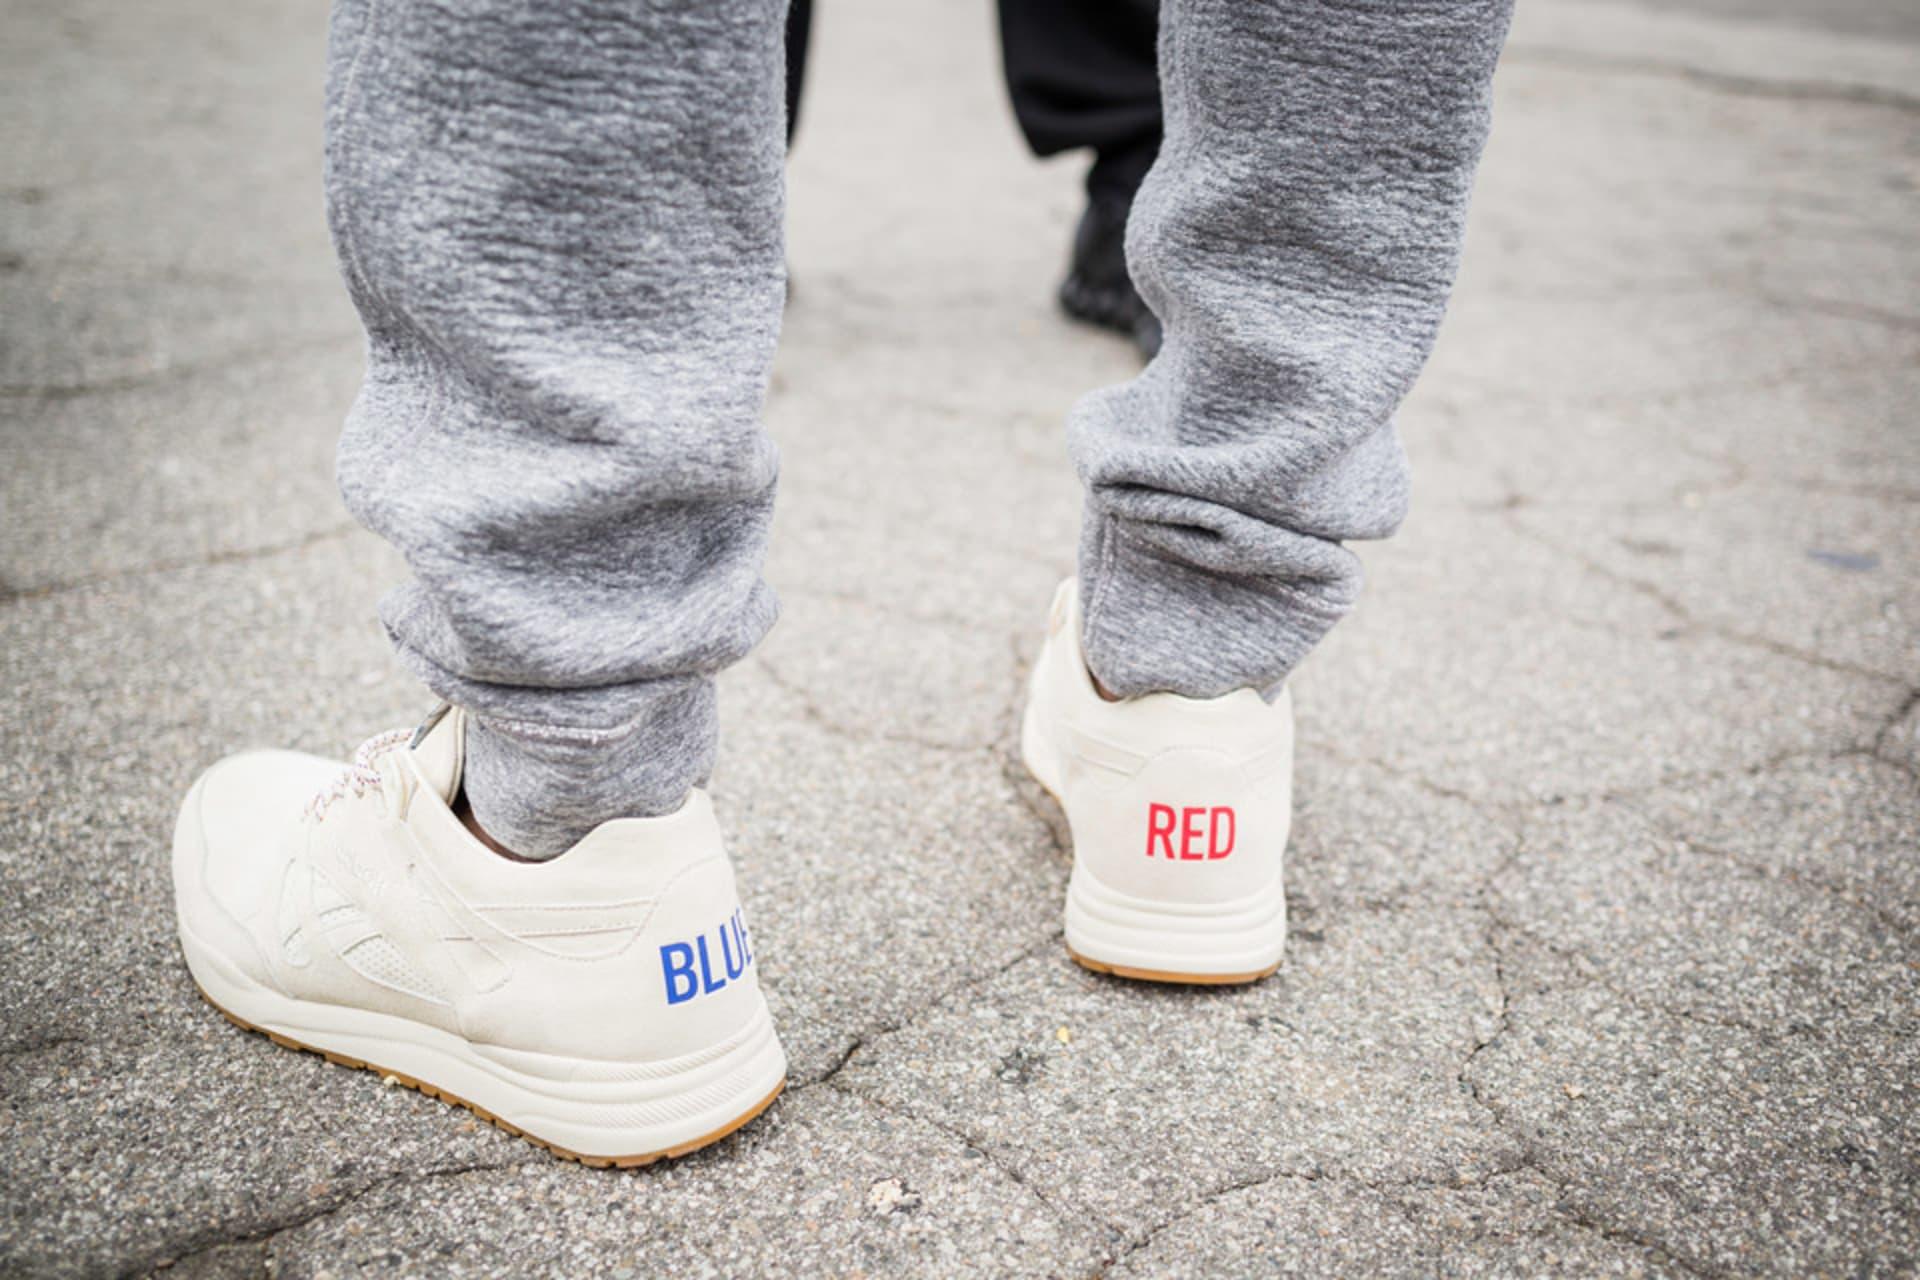 8abfdac88c01 The first Kendrick Lamar x Reebok collaboration on the Ventilator sneaker.